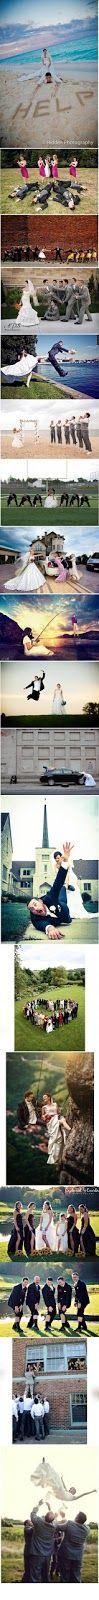 Funny weddings photo strip